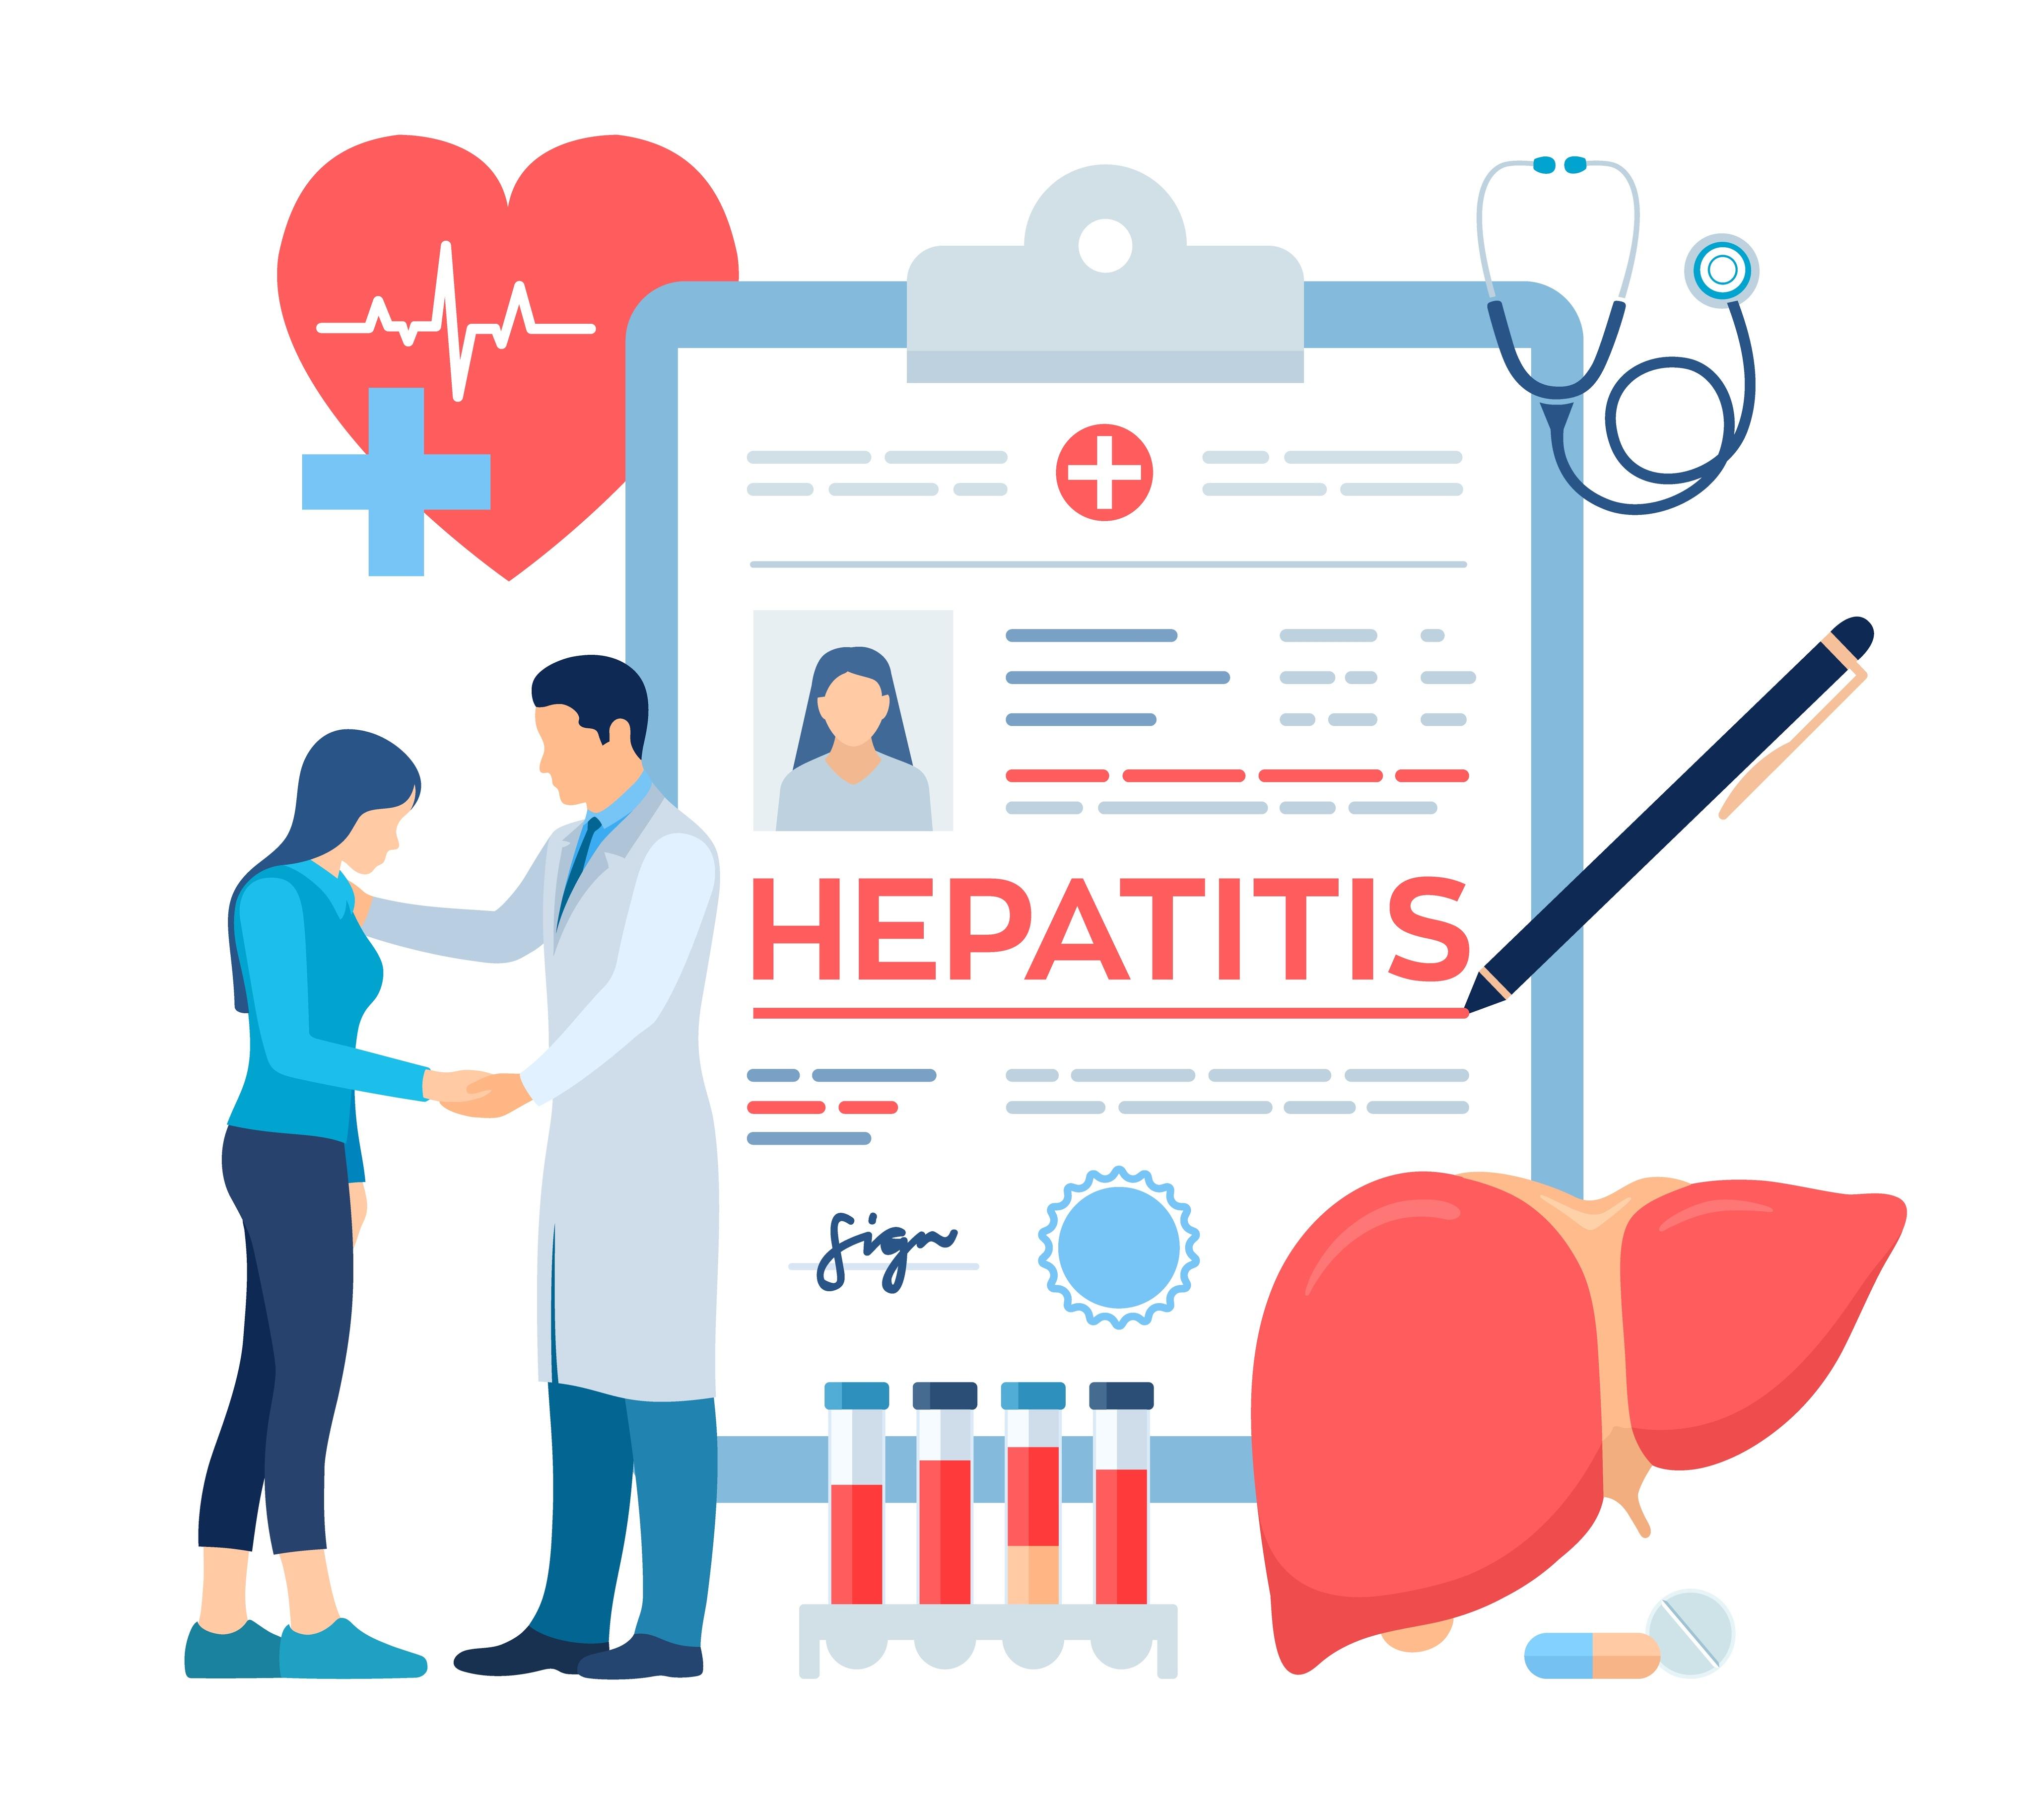 Como é feito o diagnóstico de hepatite viral?